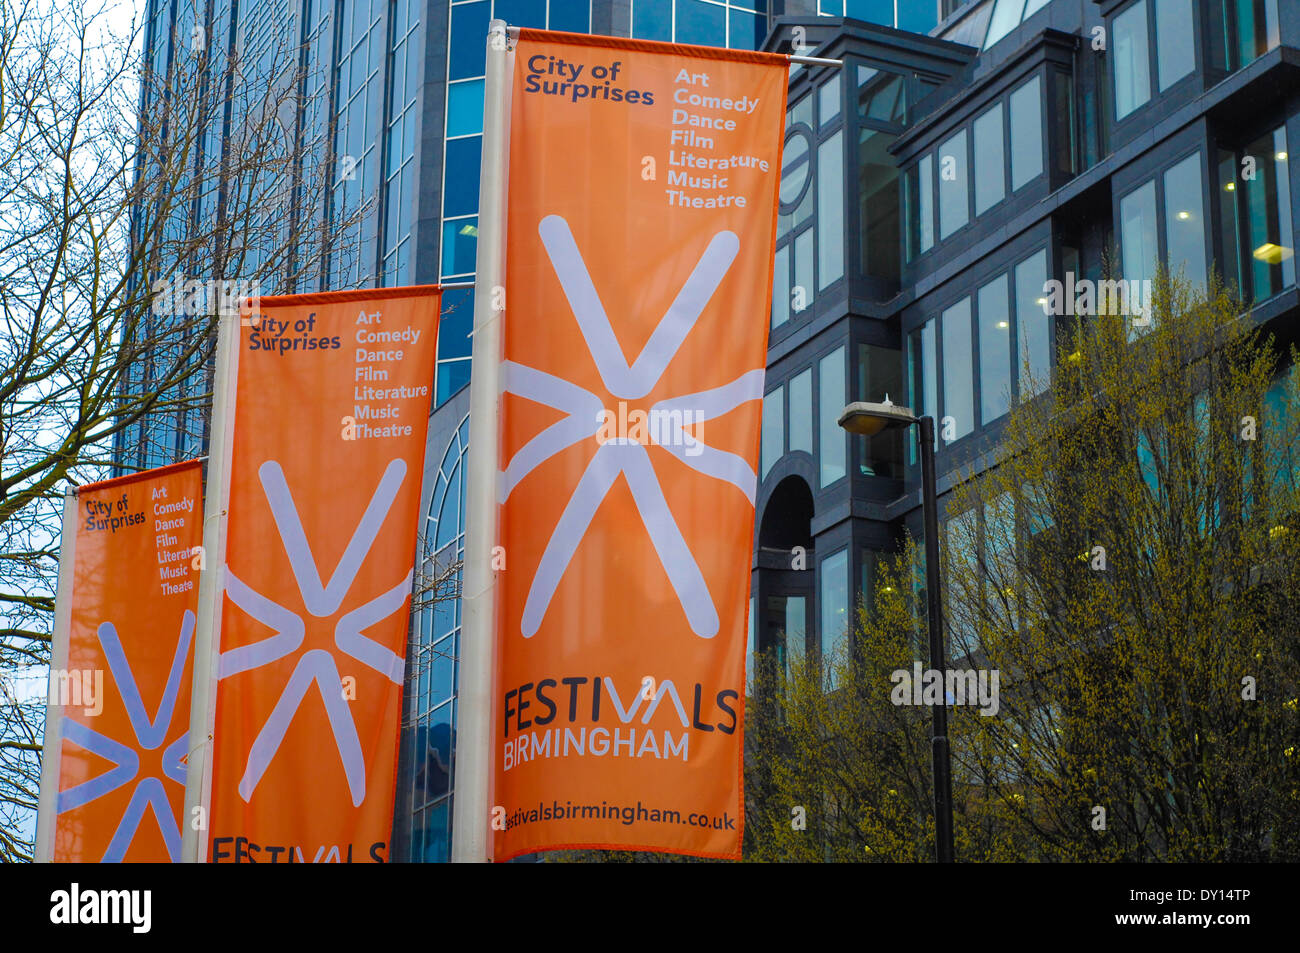 Festival Signs Imágenes De Stock   Festival Signs Fotos De Stock - Alamy 636d841908661